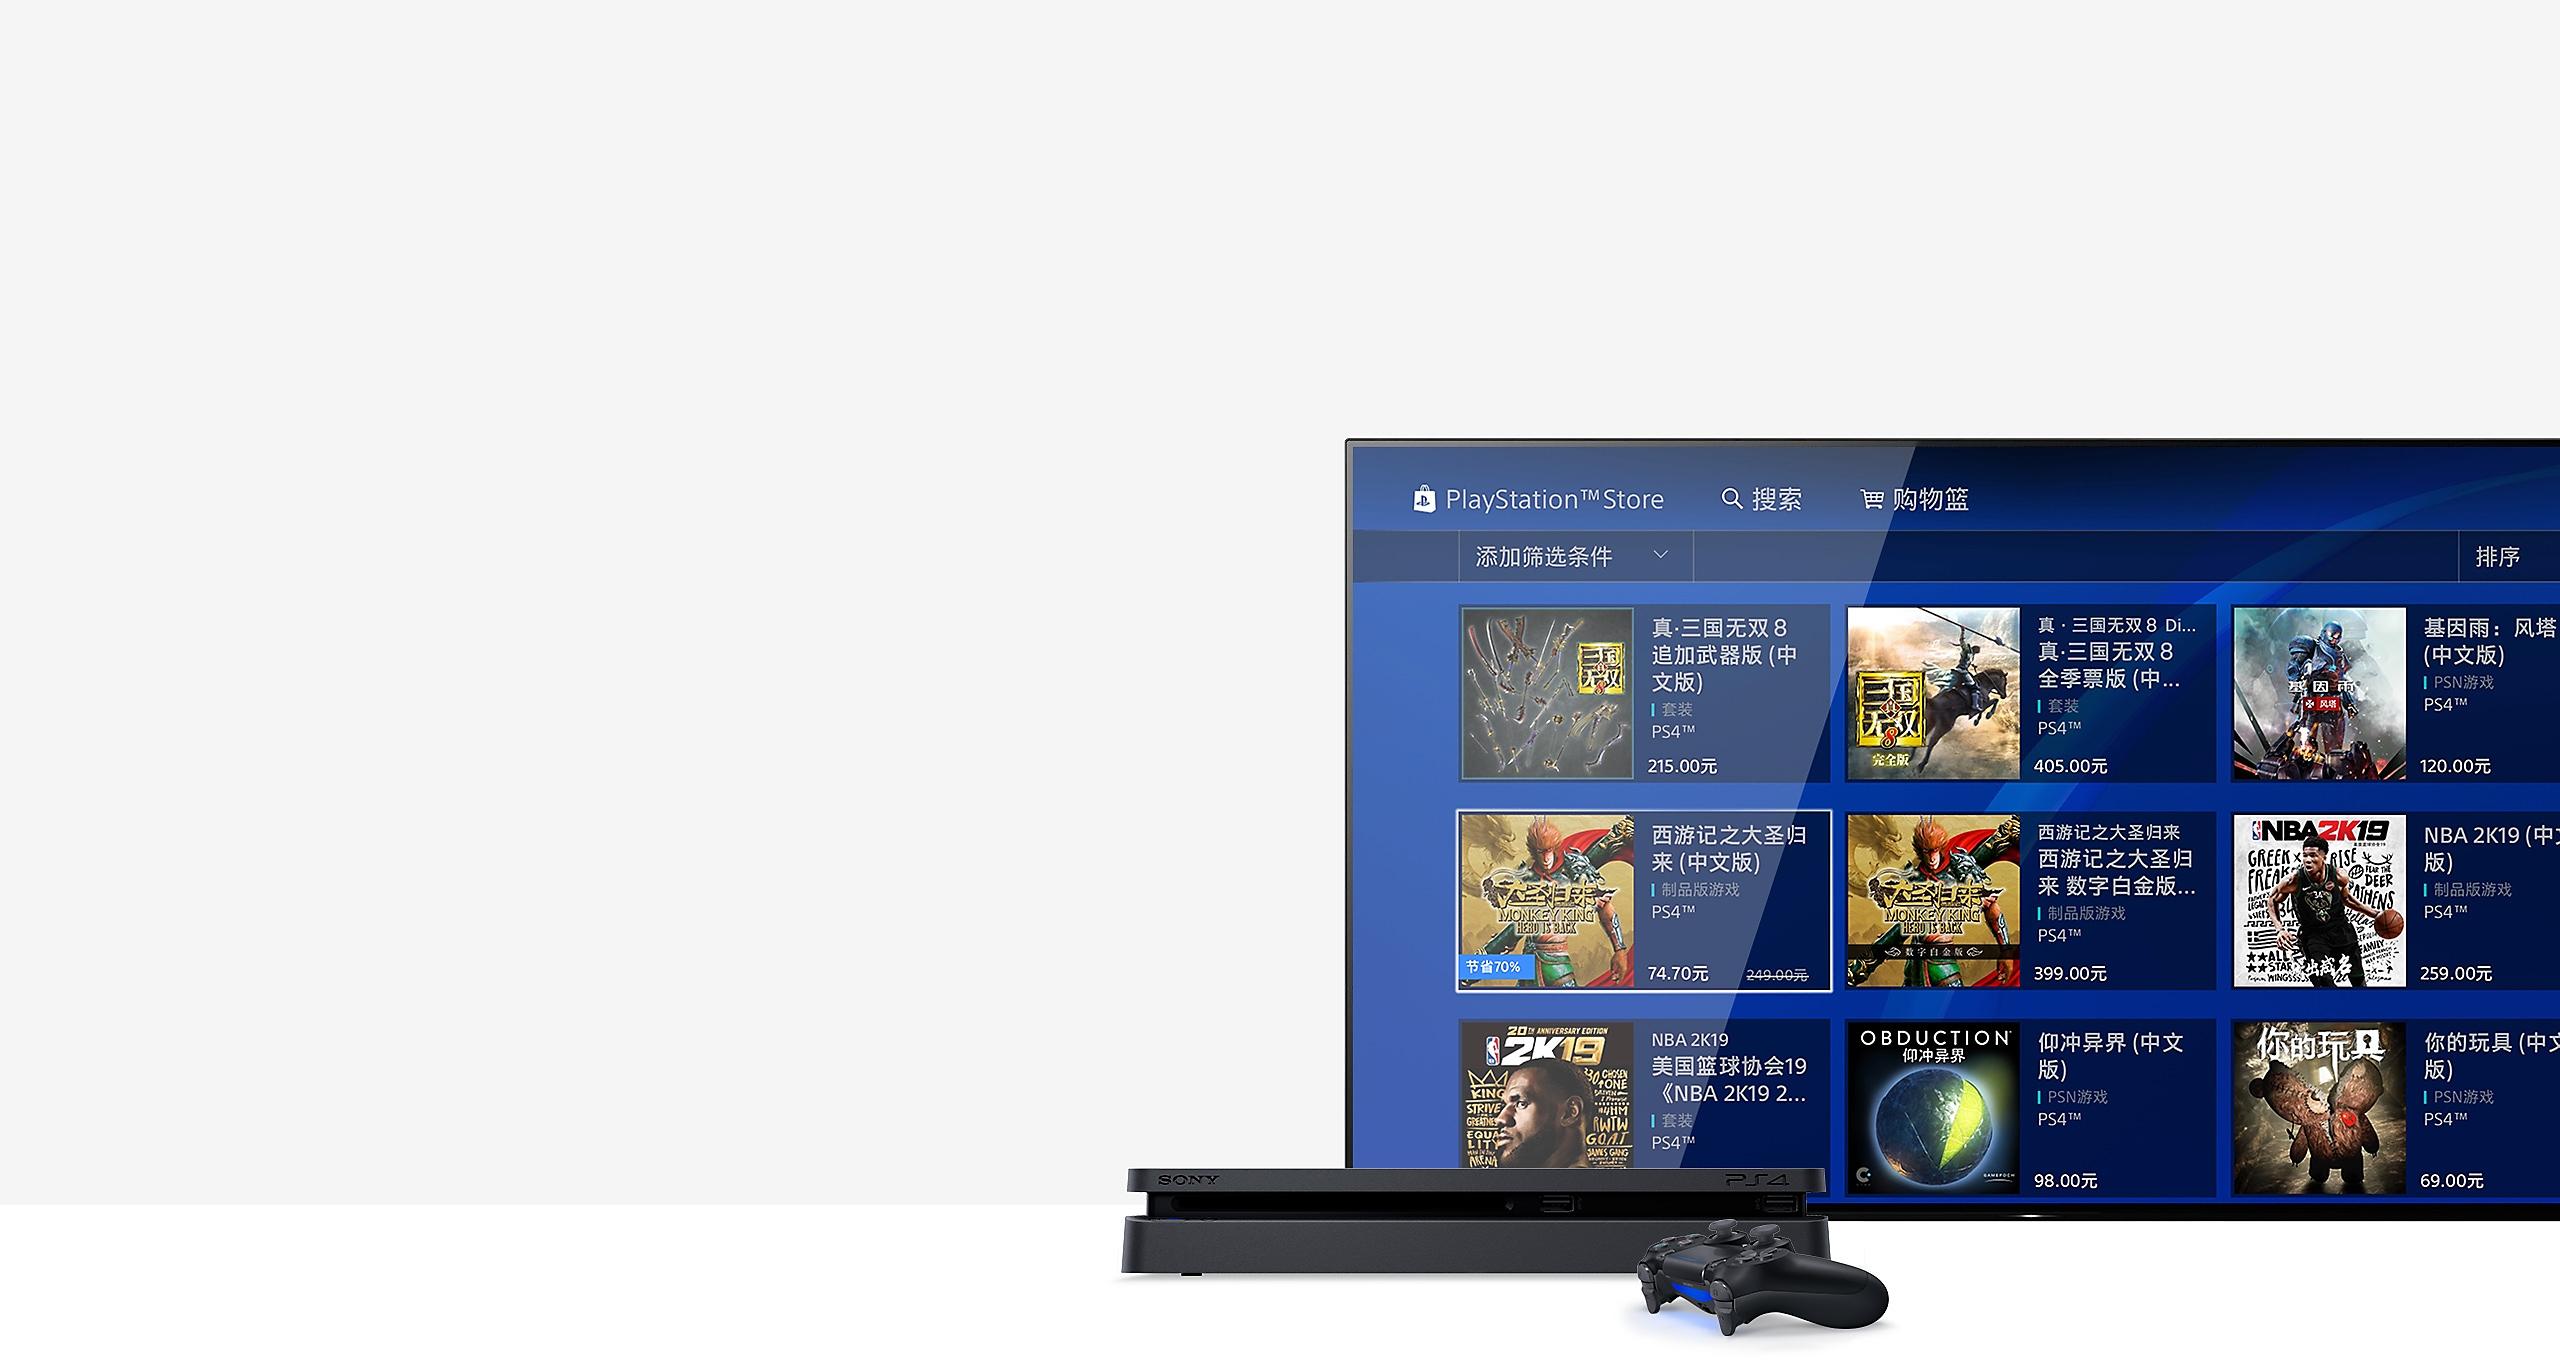 PlayStation Store - 种类多元